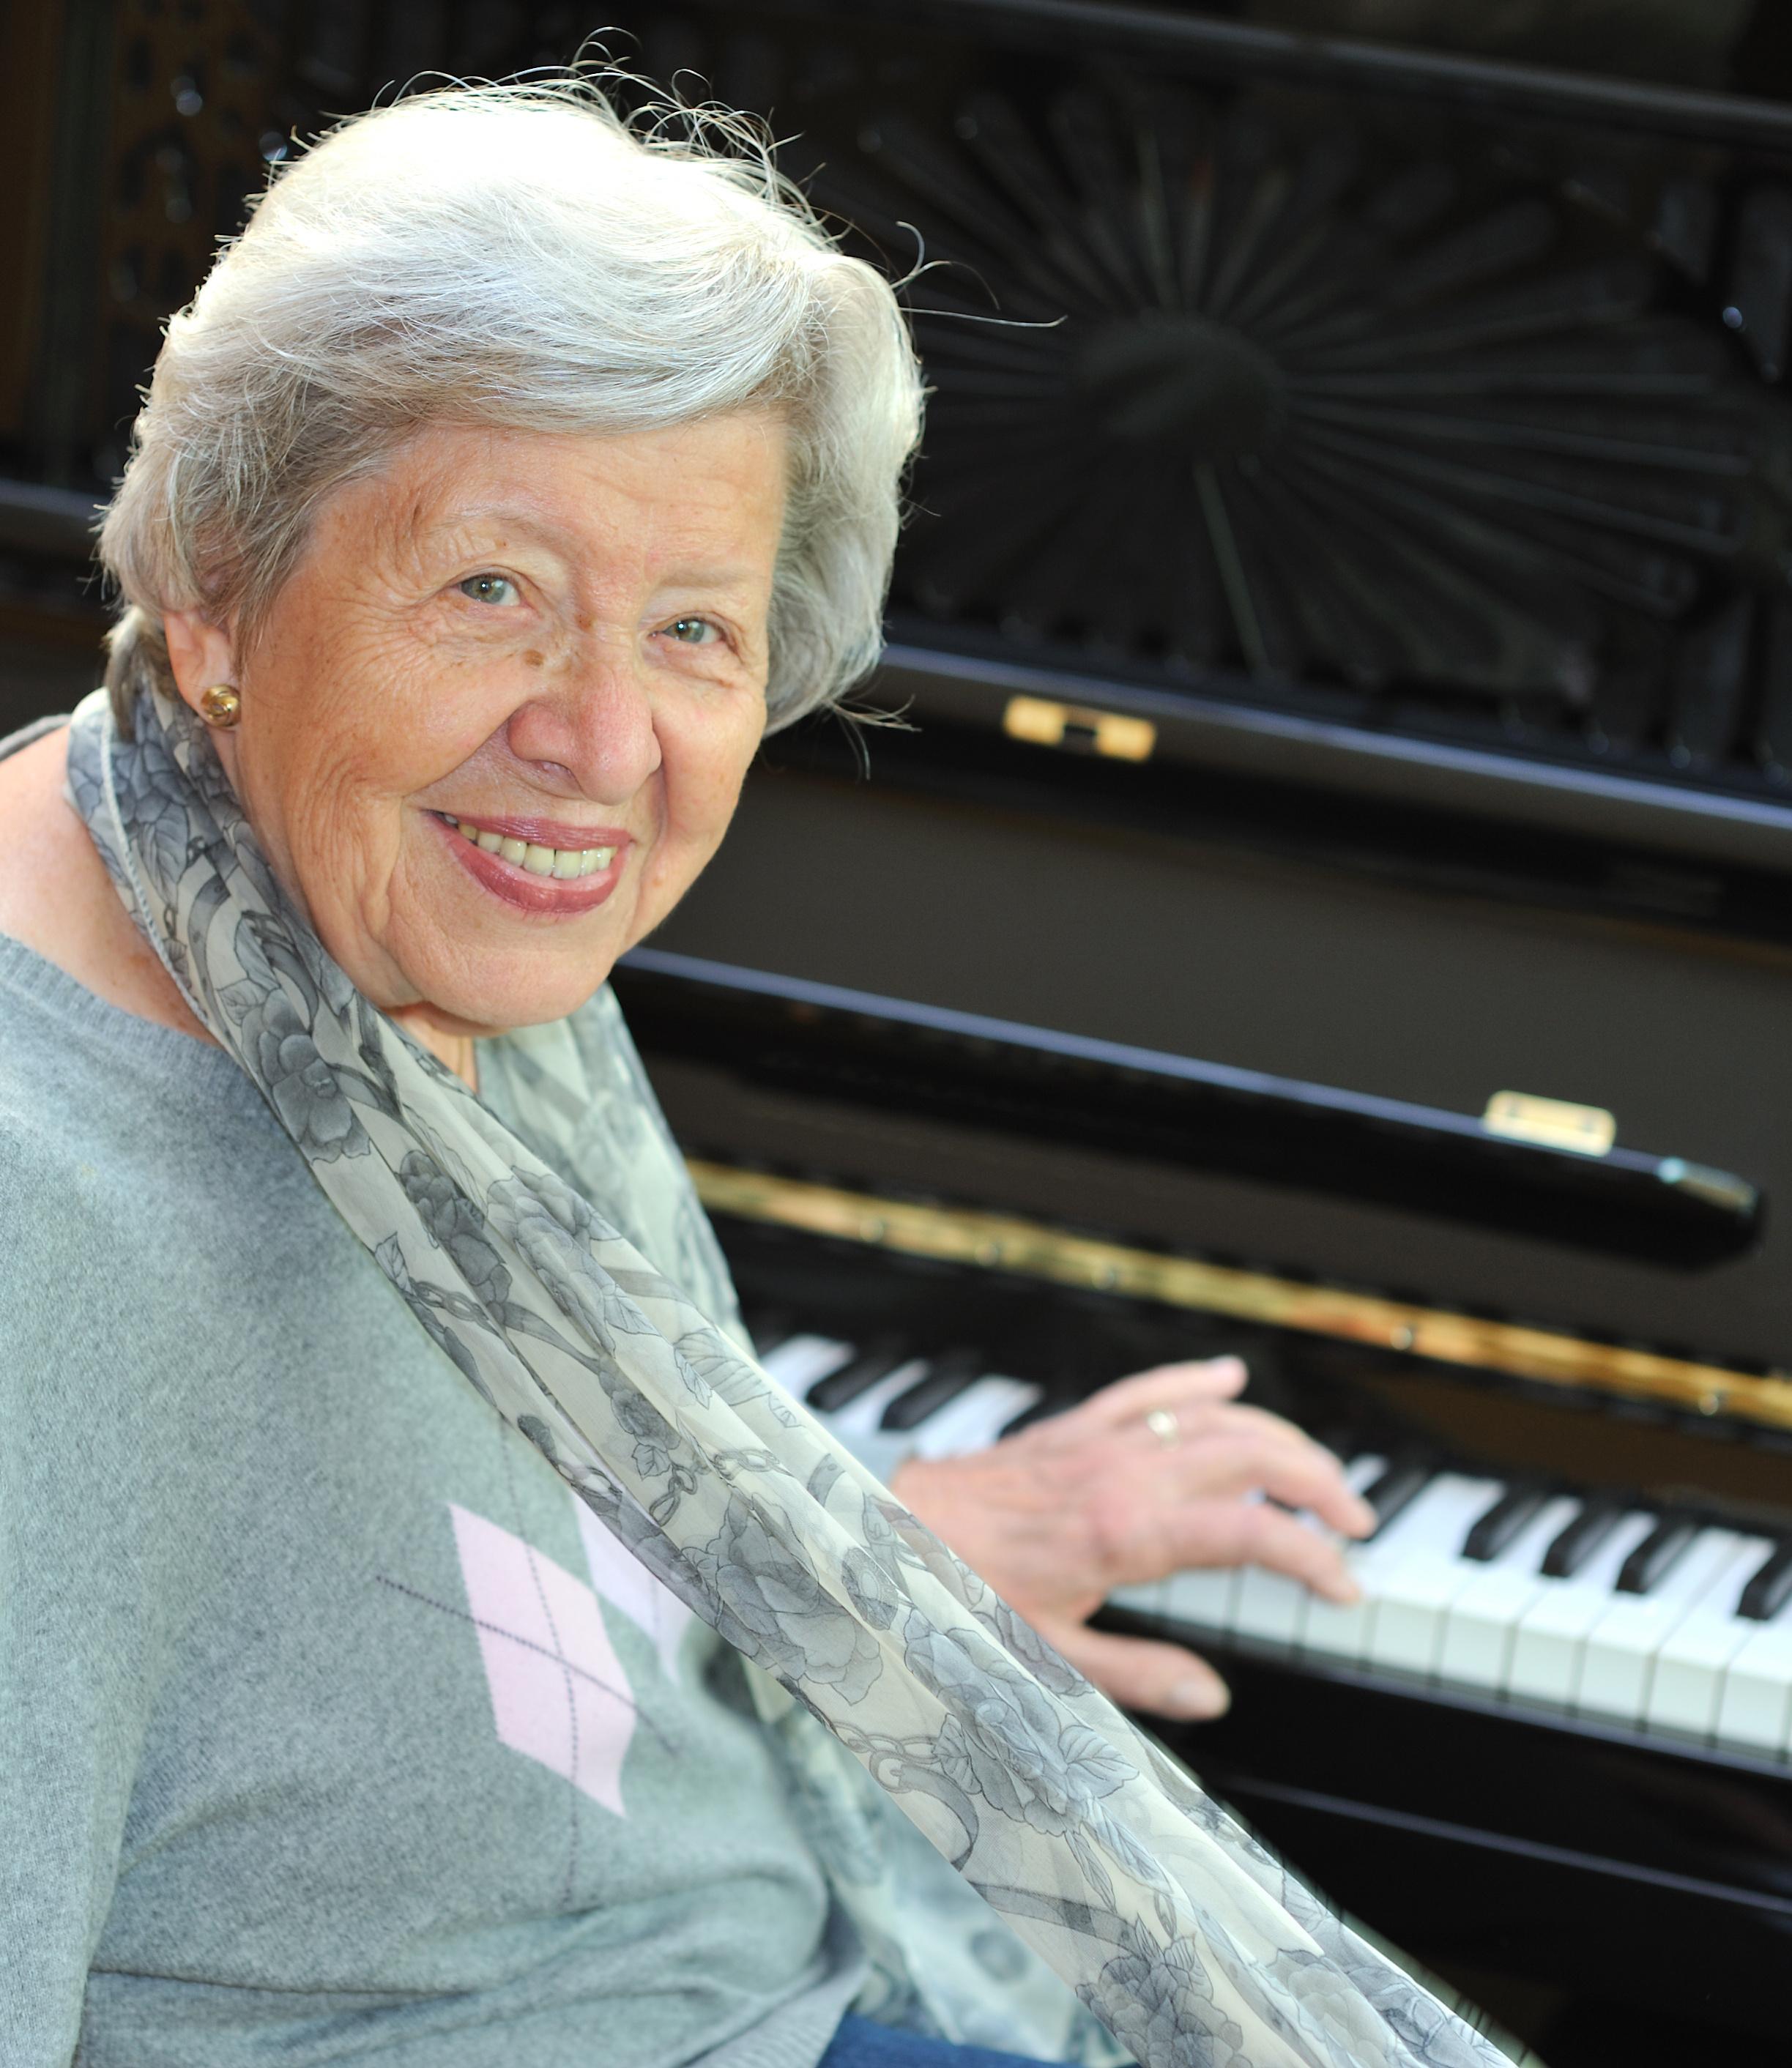 Mrs. R. Scott Patton, Age 82